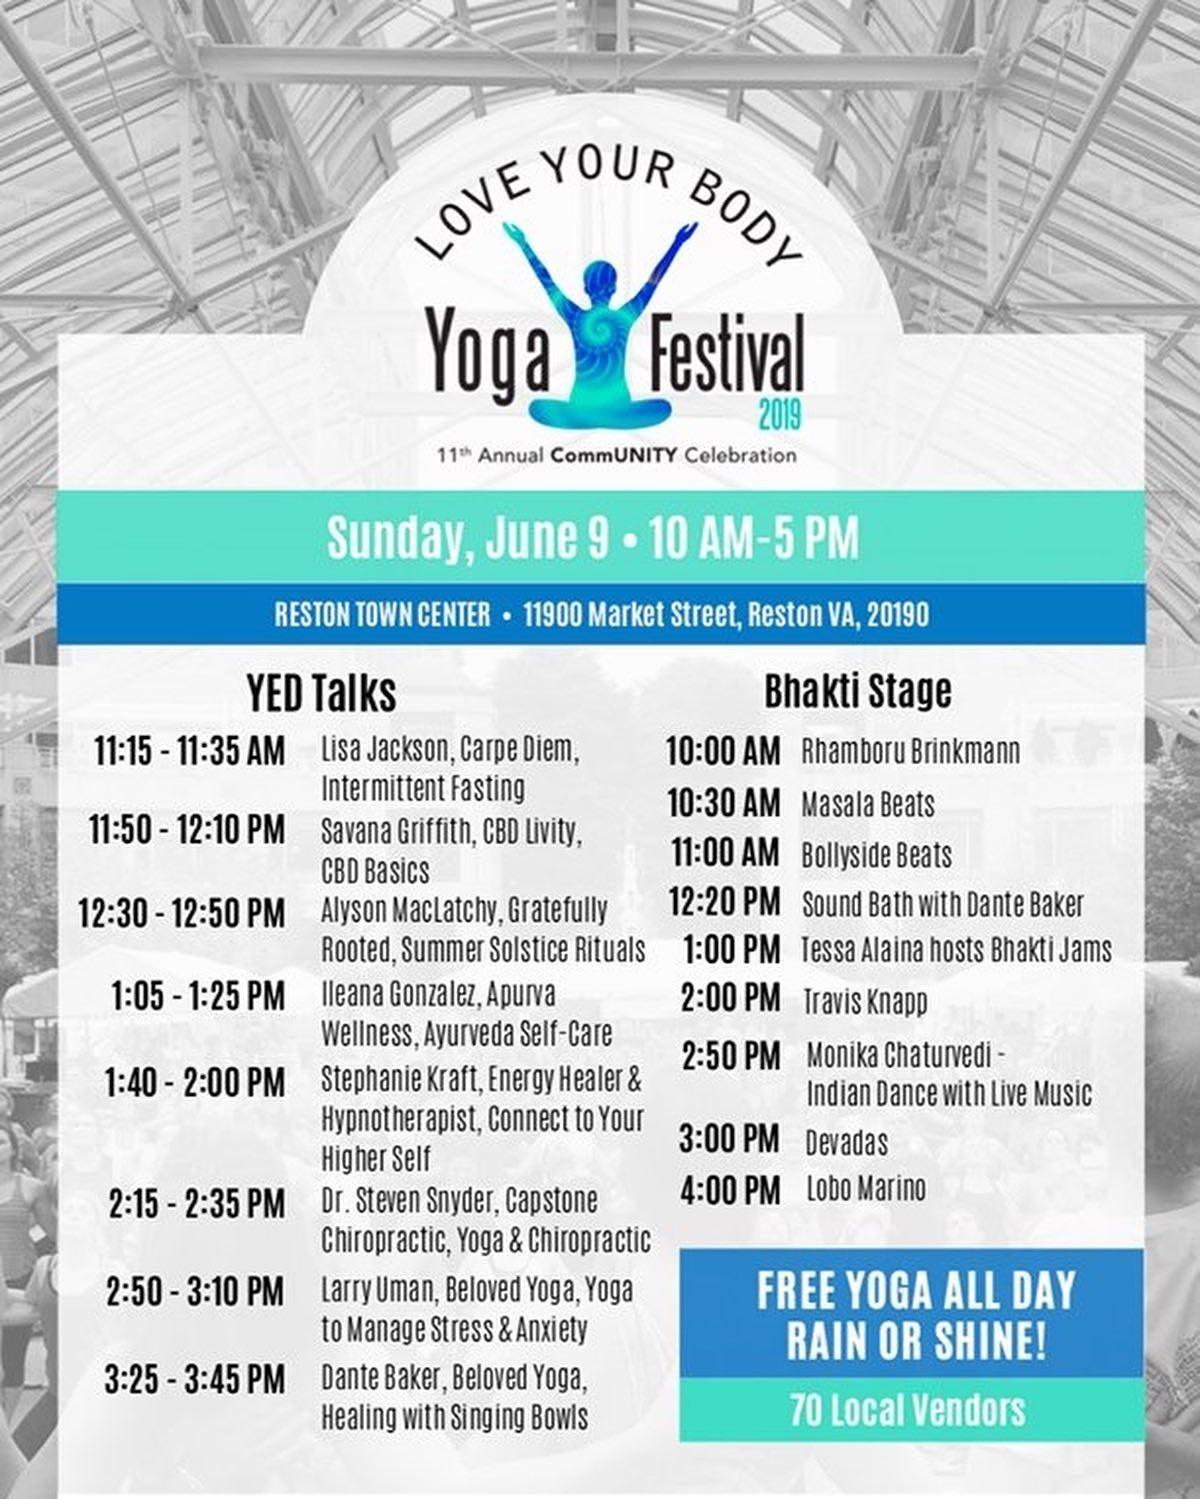 Event Schedule — Love Your Body Yoga Festival June 9, 2019